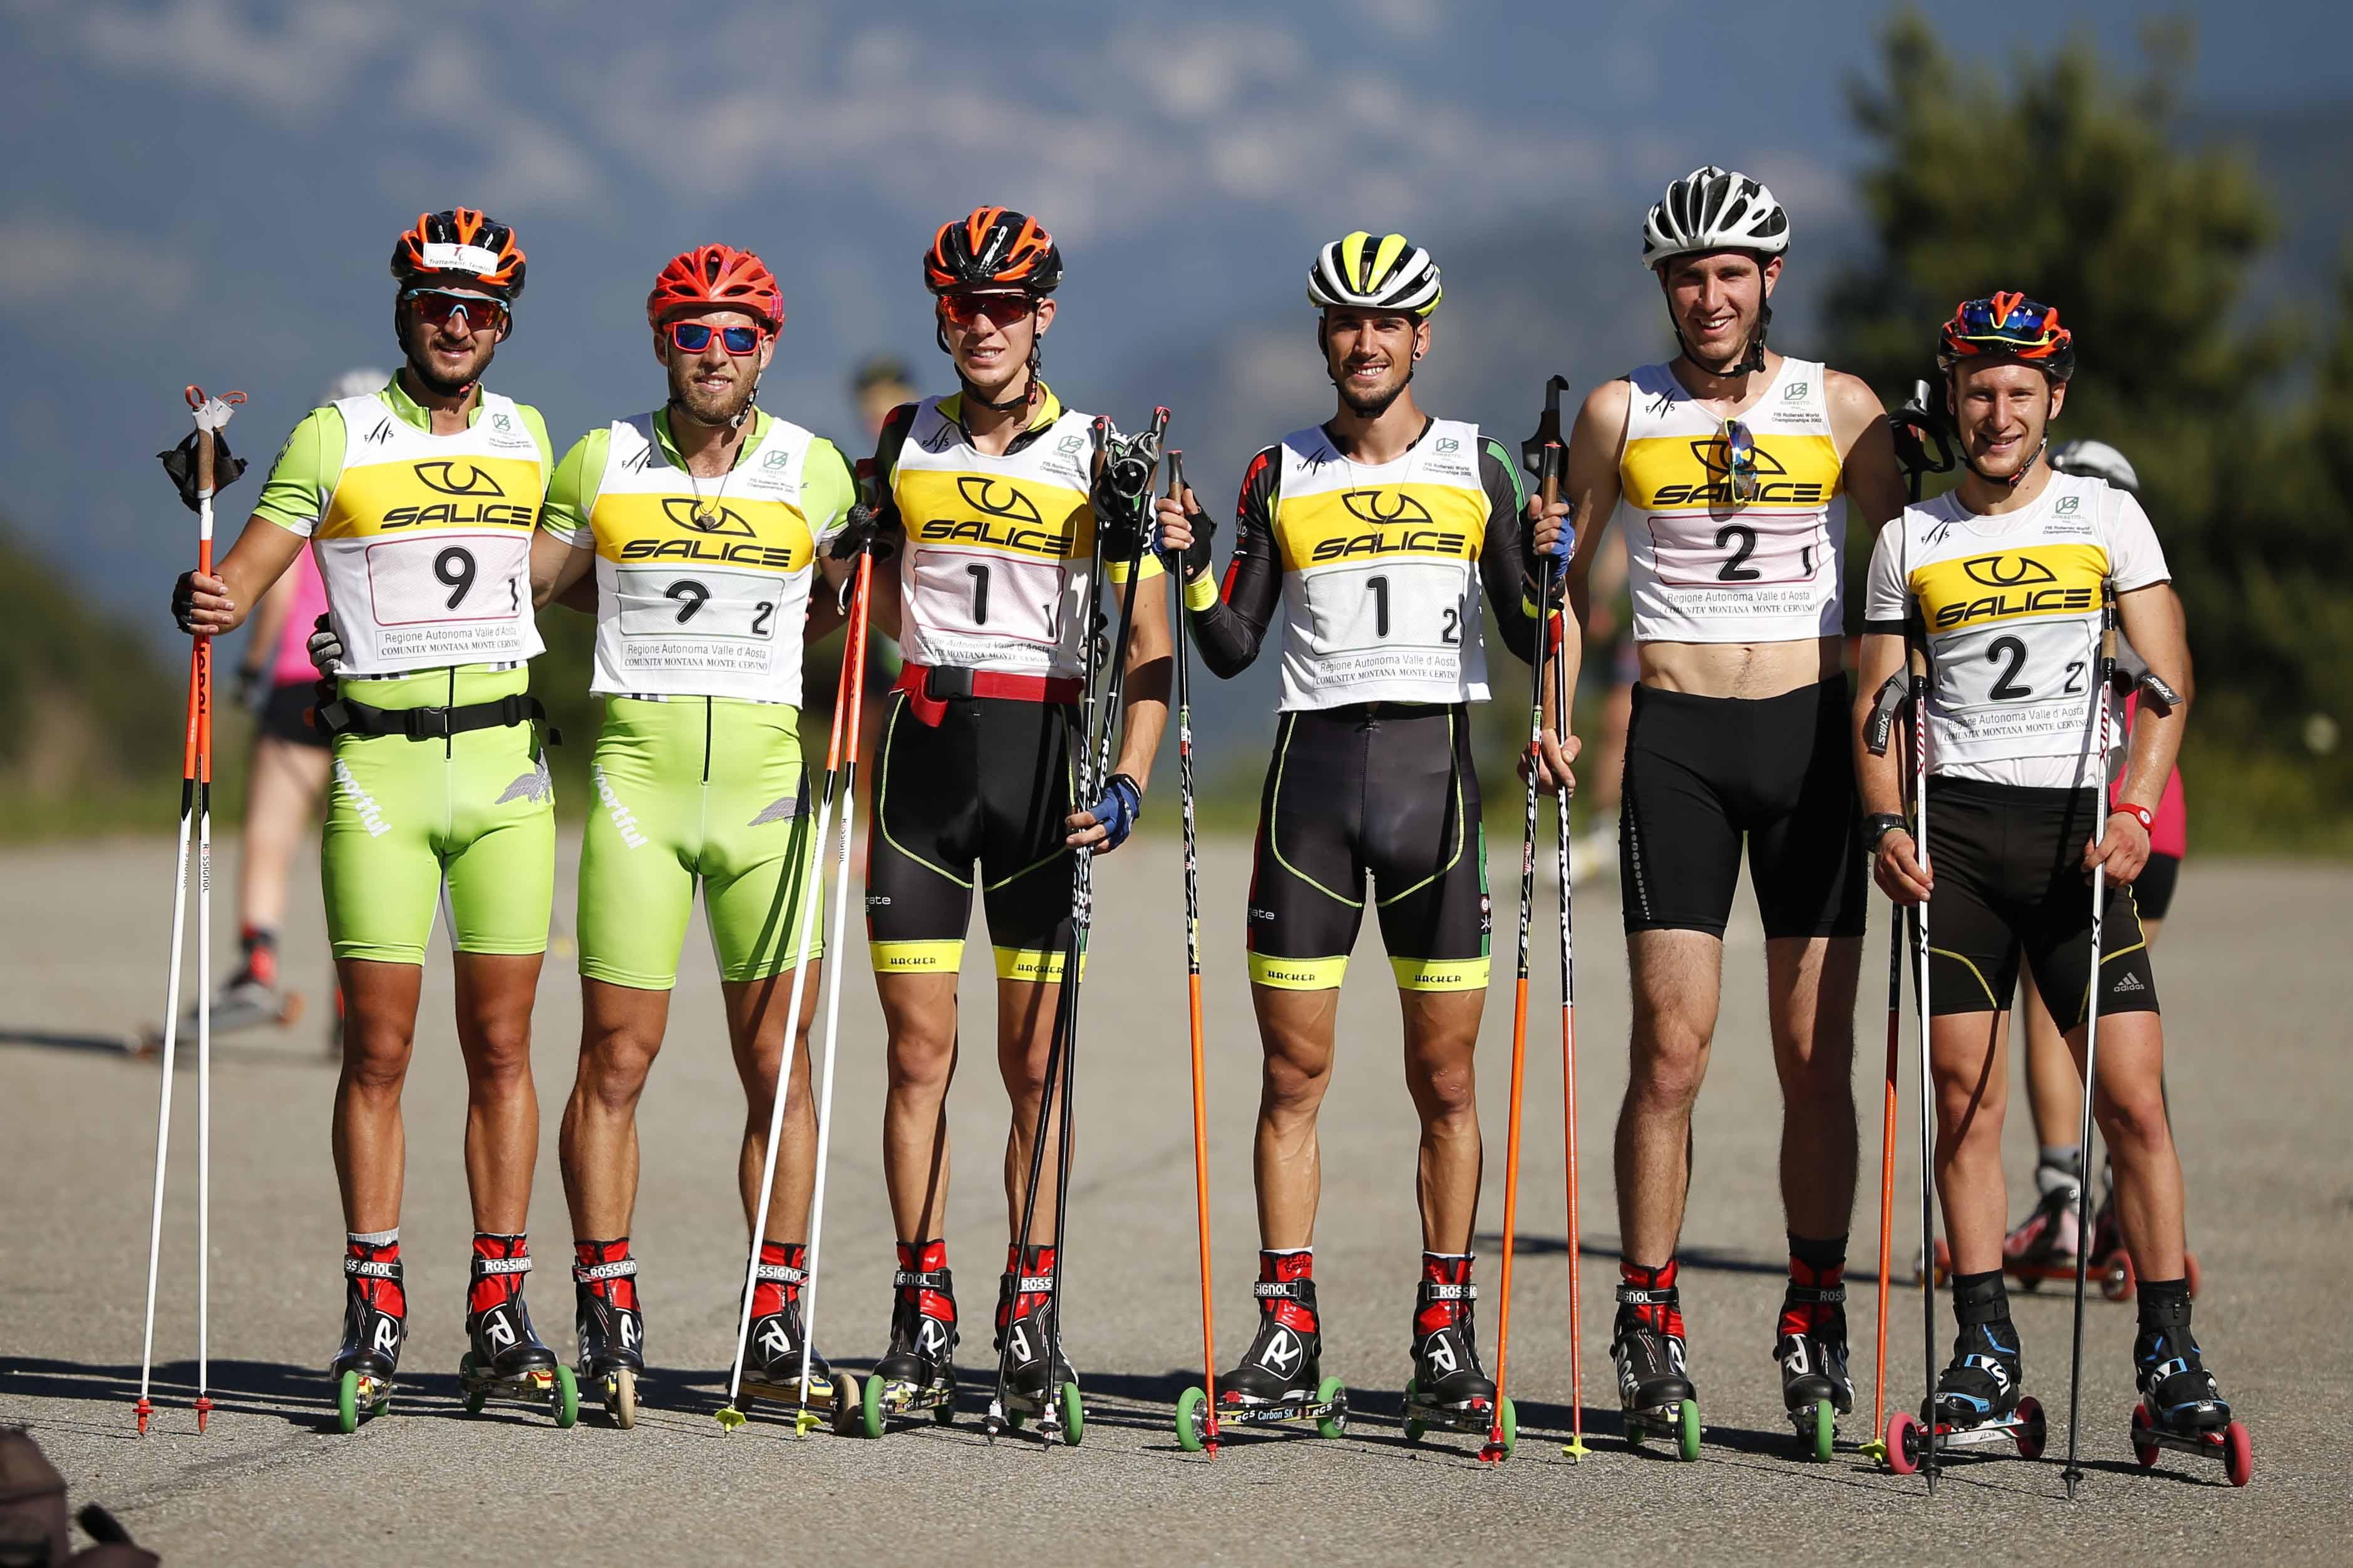 16.07.2016 I risultati dei Campionati Italiani Team Sprint a Verrayes (AO)